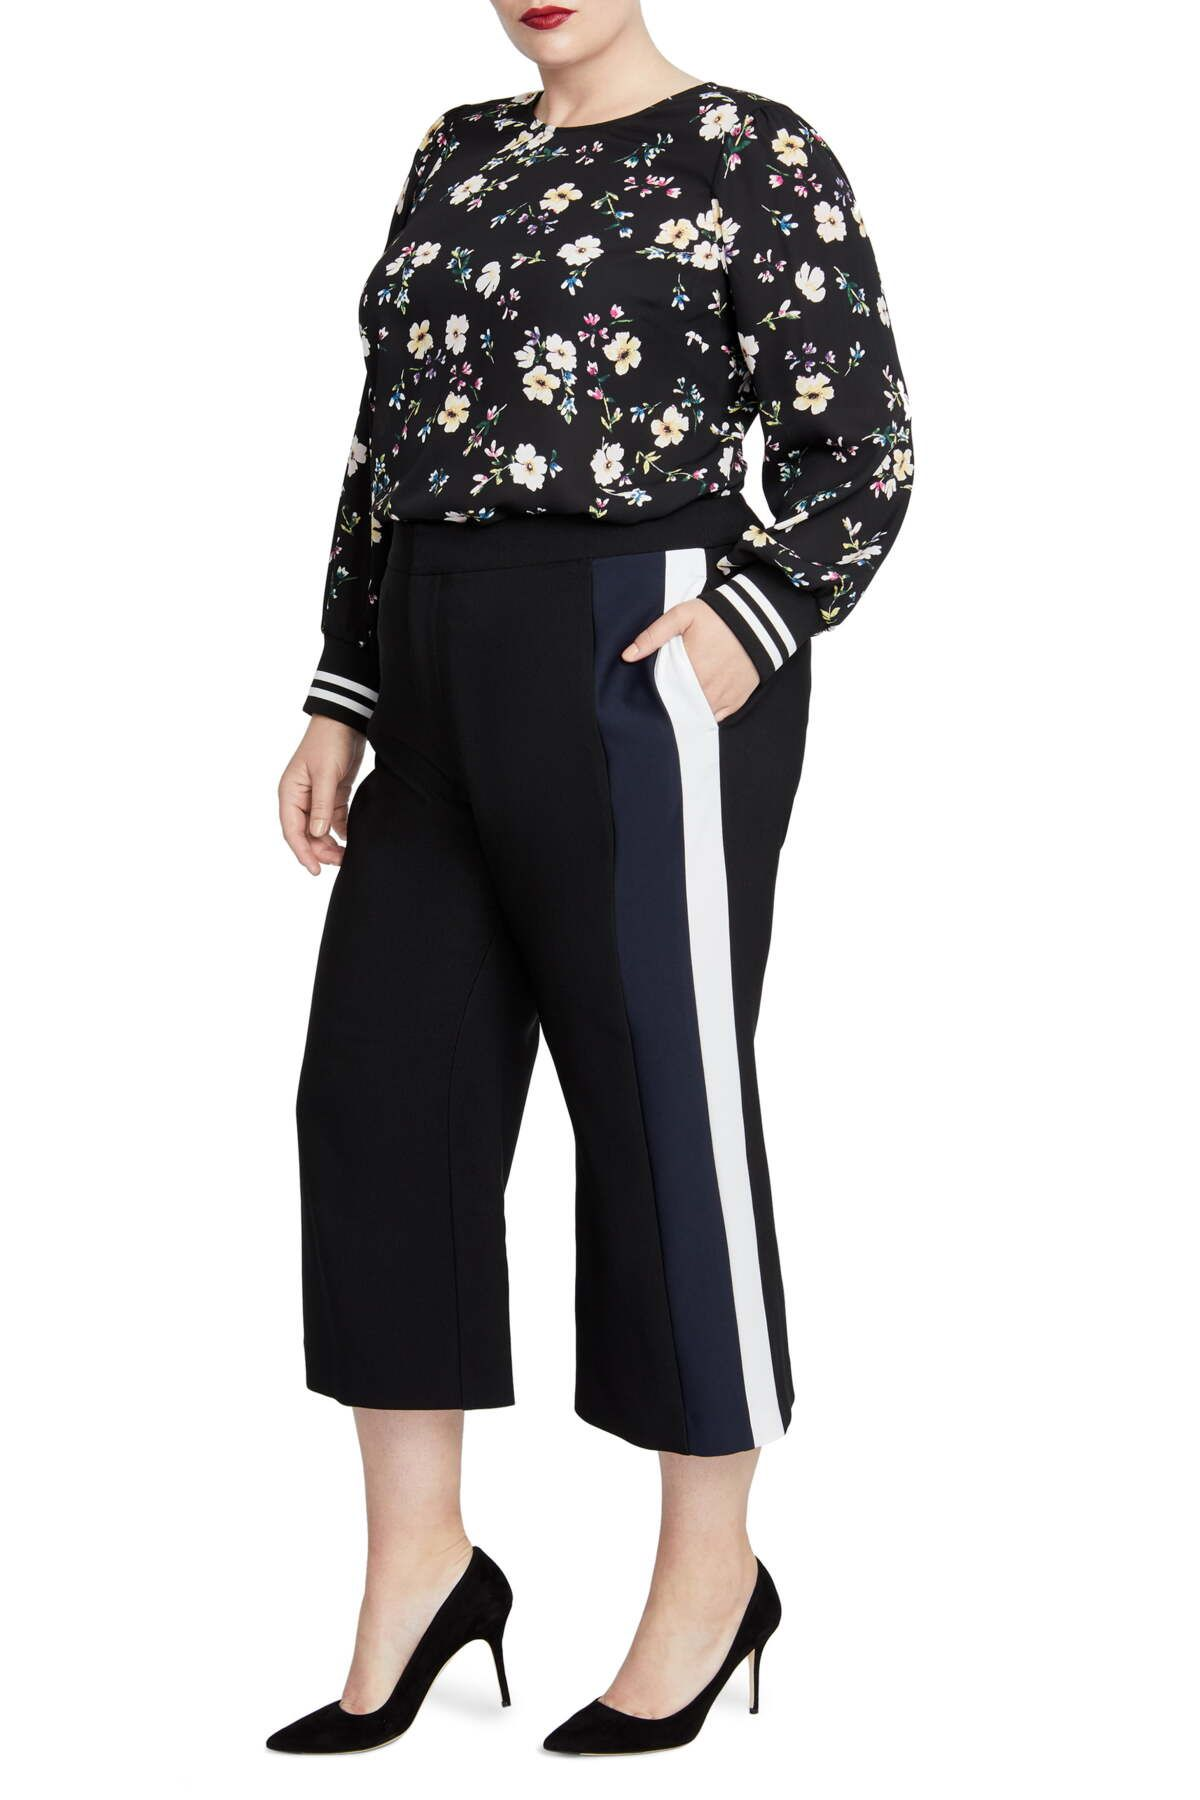 Rachel Roy | Gwen Crop Pants (Plus Size) | Nordstrom Rack #nordstromrack